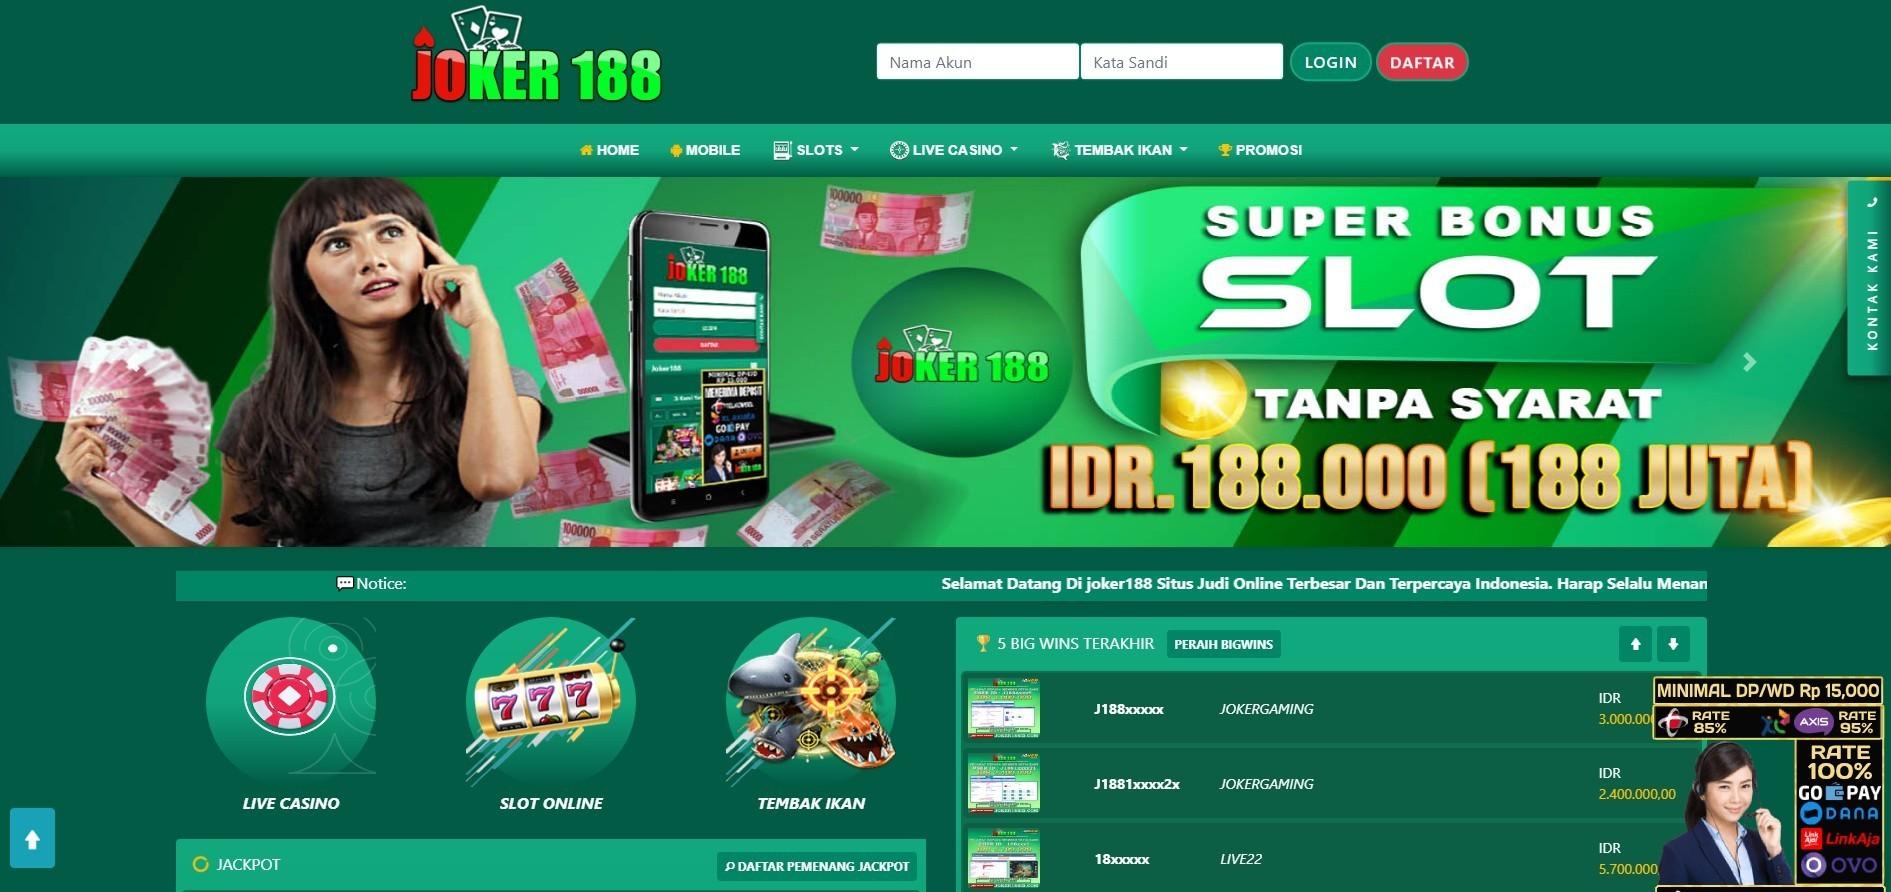 Jual Tiket Joker188 Situs Mesin Slots Online Deposit Aplikasi Ovo Loket Com